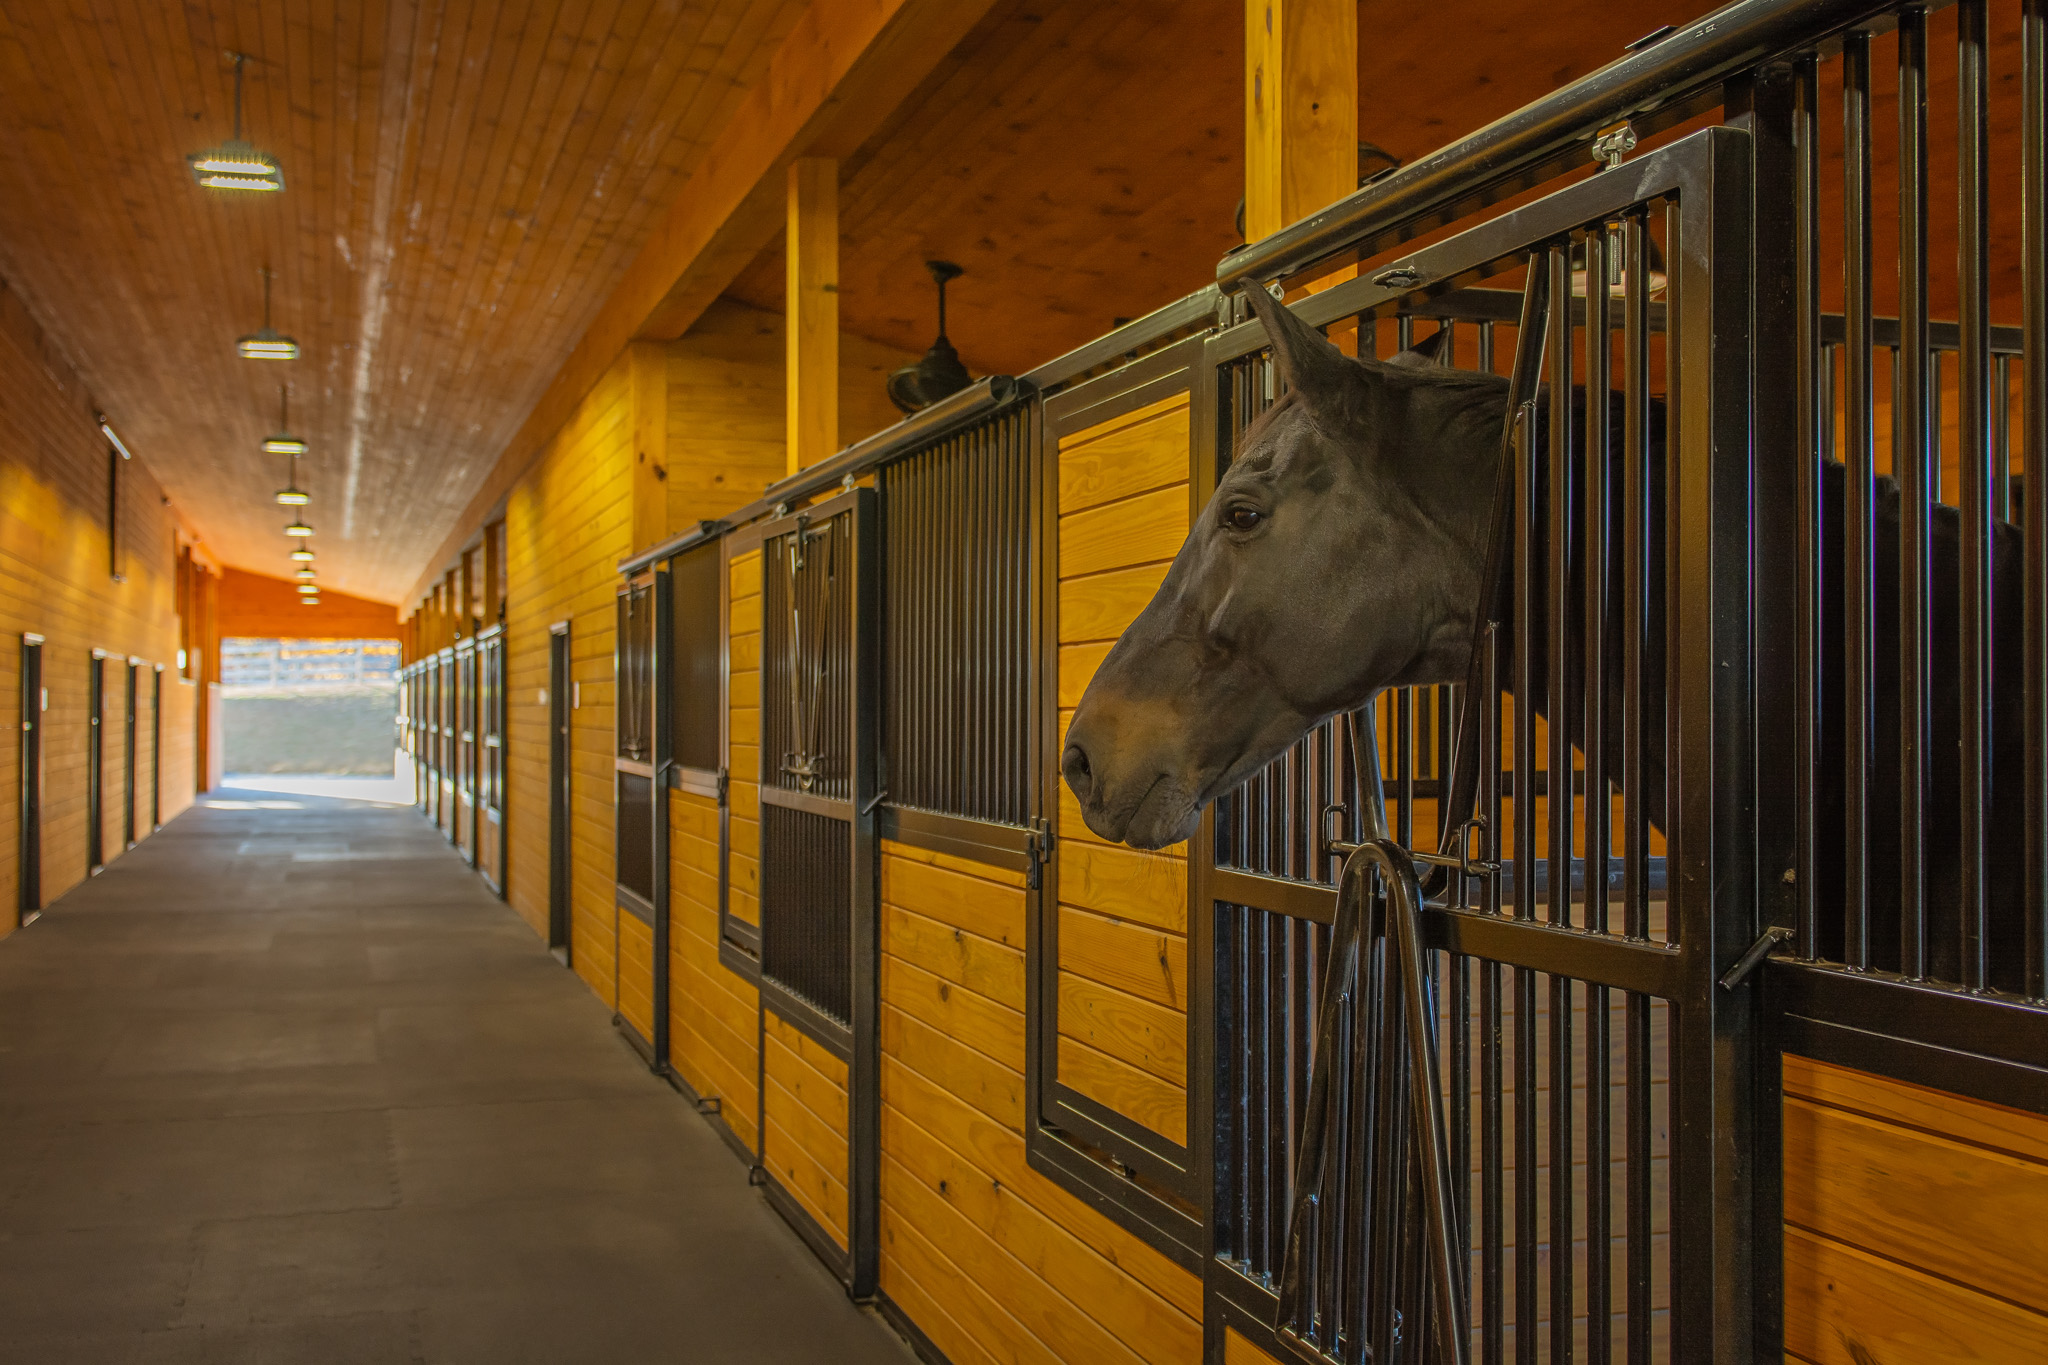 horse in stable.jpg